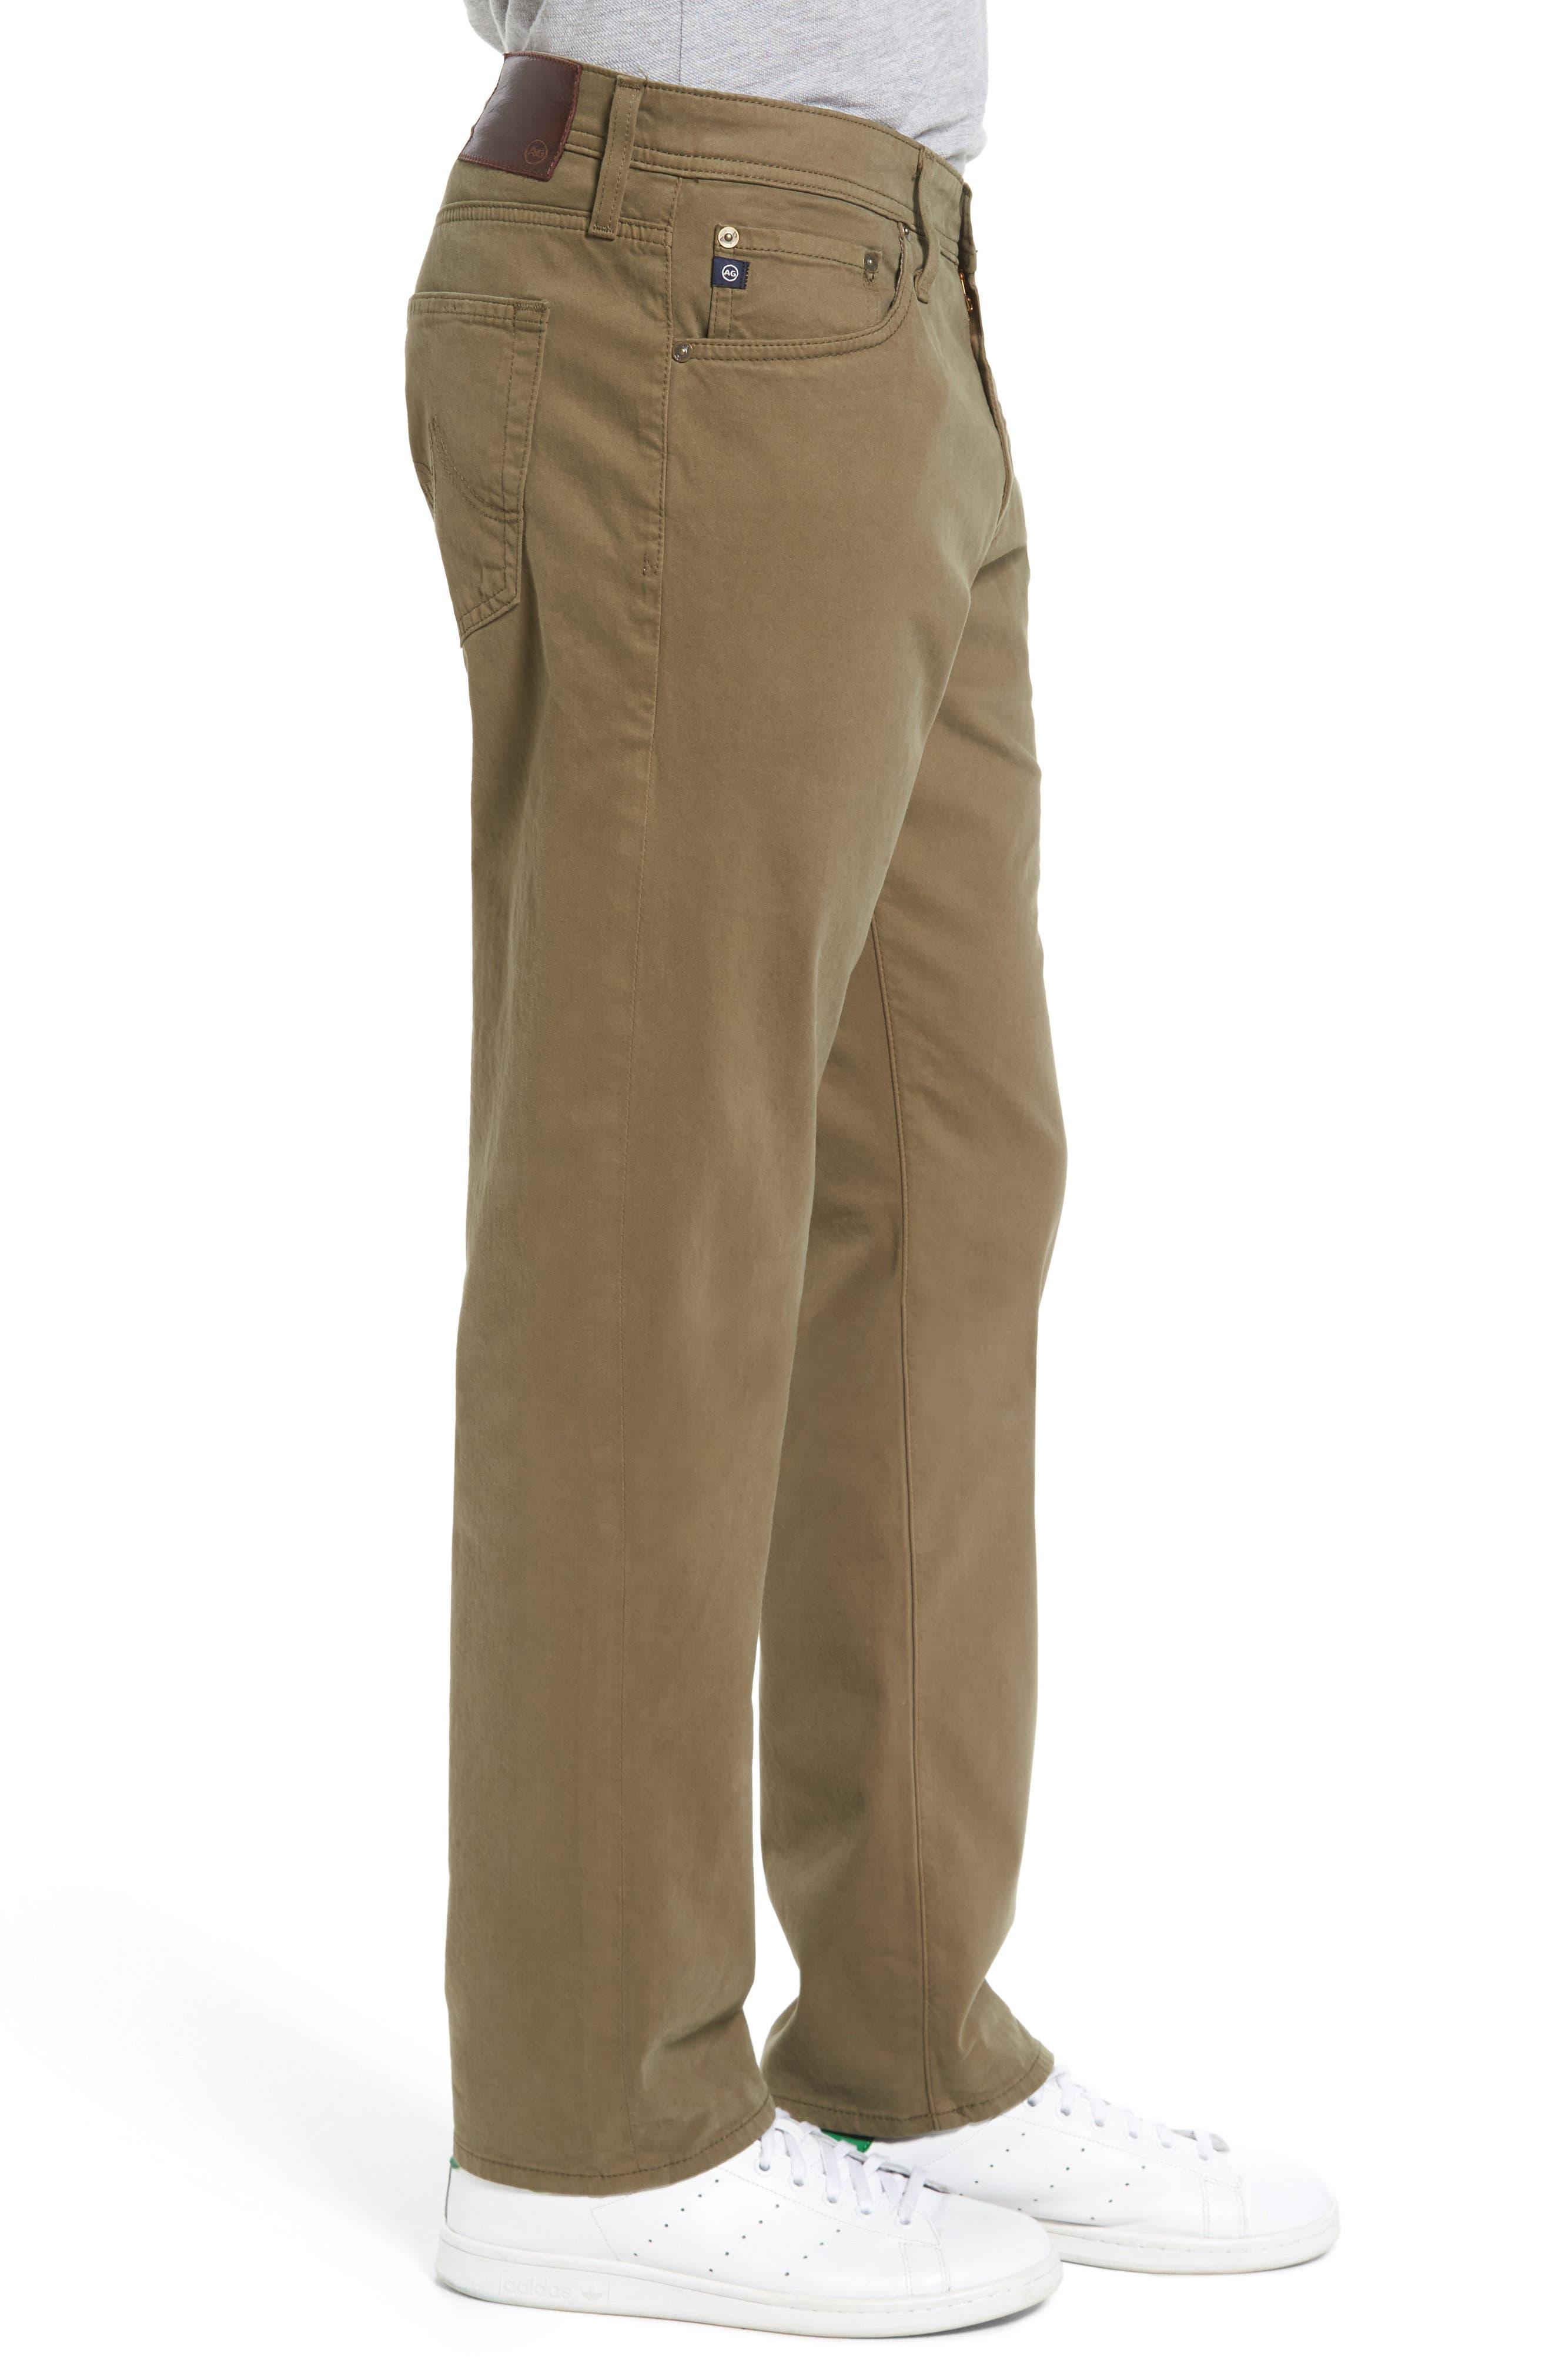 Graduate SUD Slim Straight Leg Pants,                             Alternate thumbnail 3, color,                             Caper Leaf